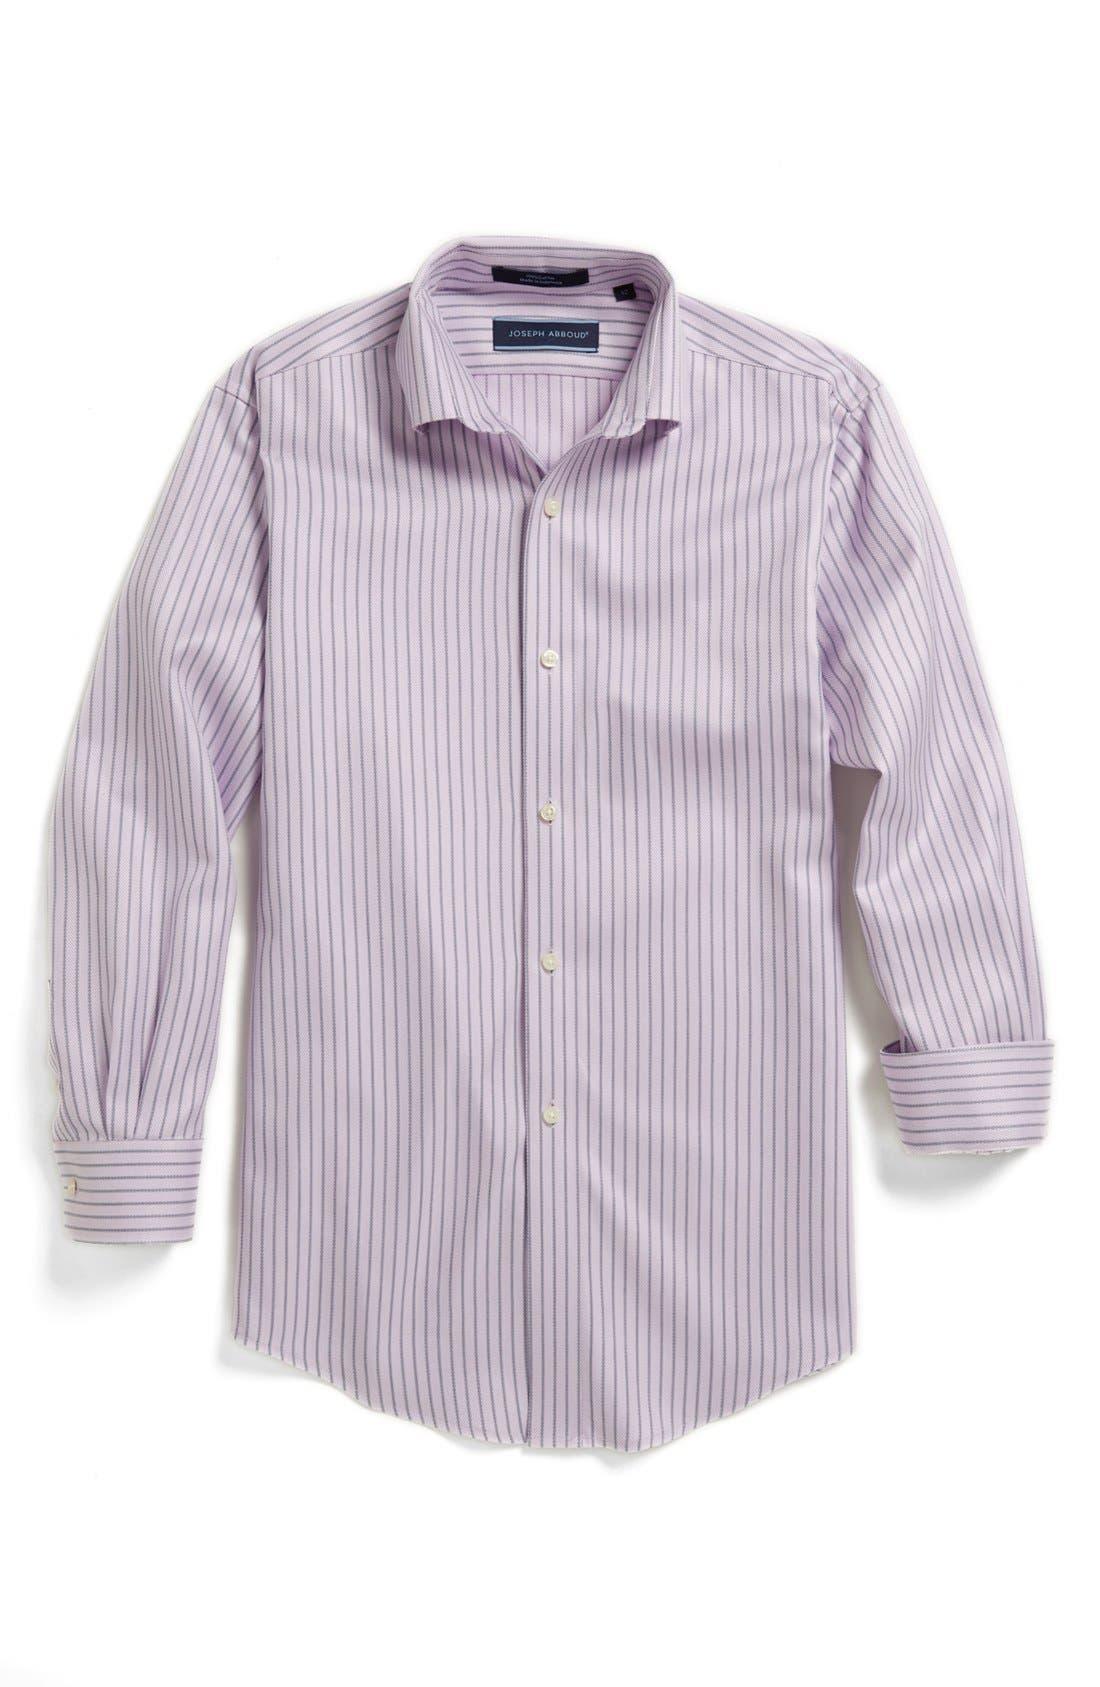 Alternate Image 1 Selected - Joseph Abboud Stripe Dress Shirt (Big Boys)